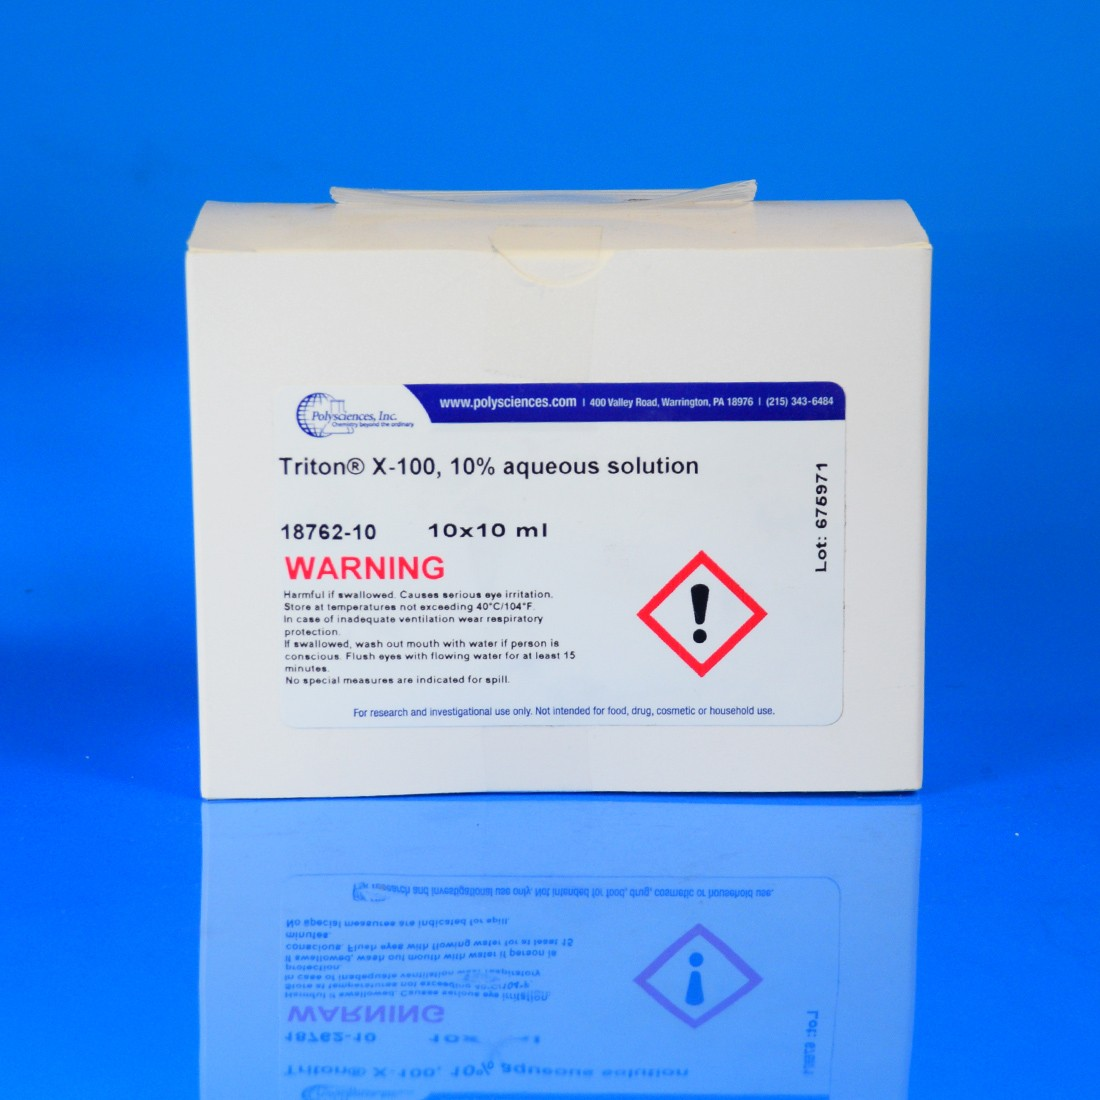 Triton<sup>®</sup> X-100, 10% aqueous solution